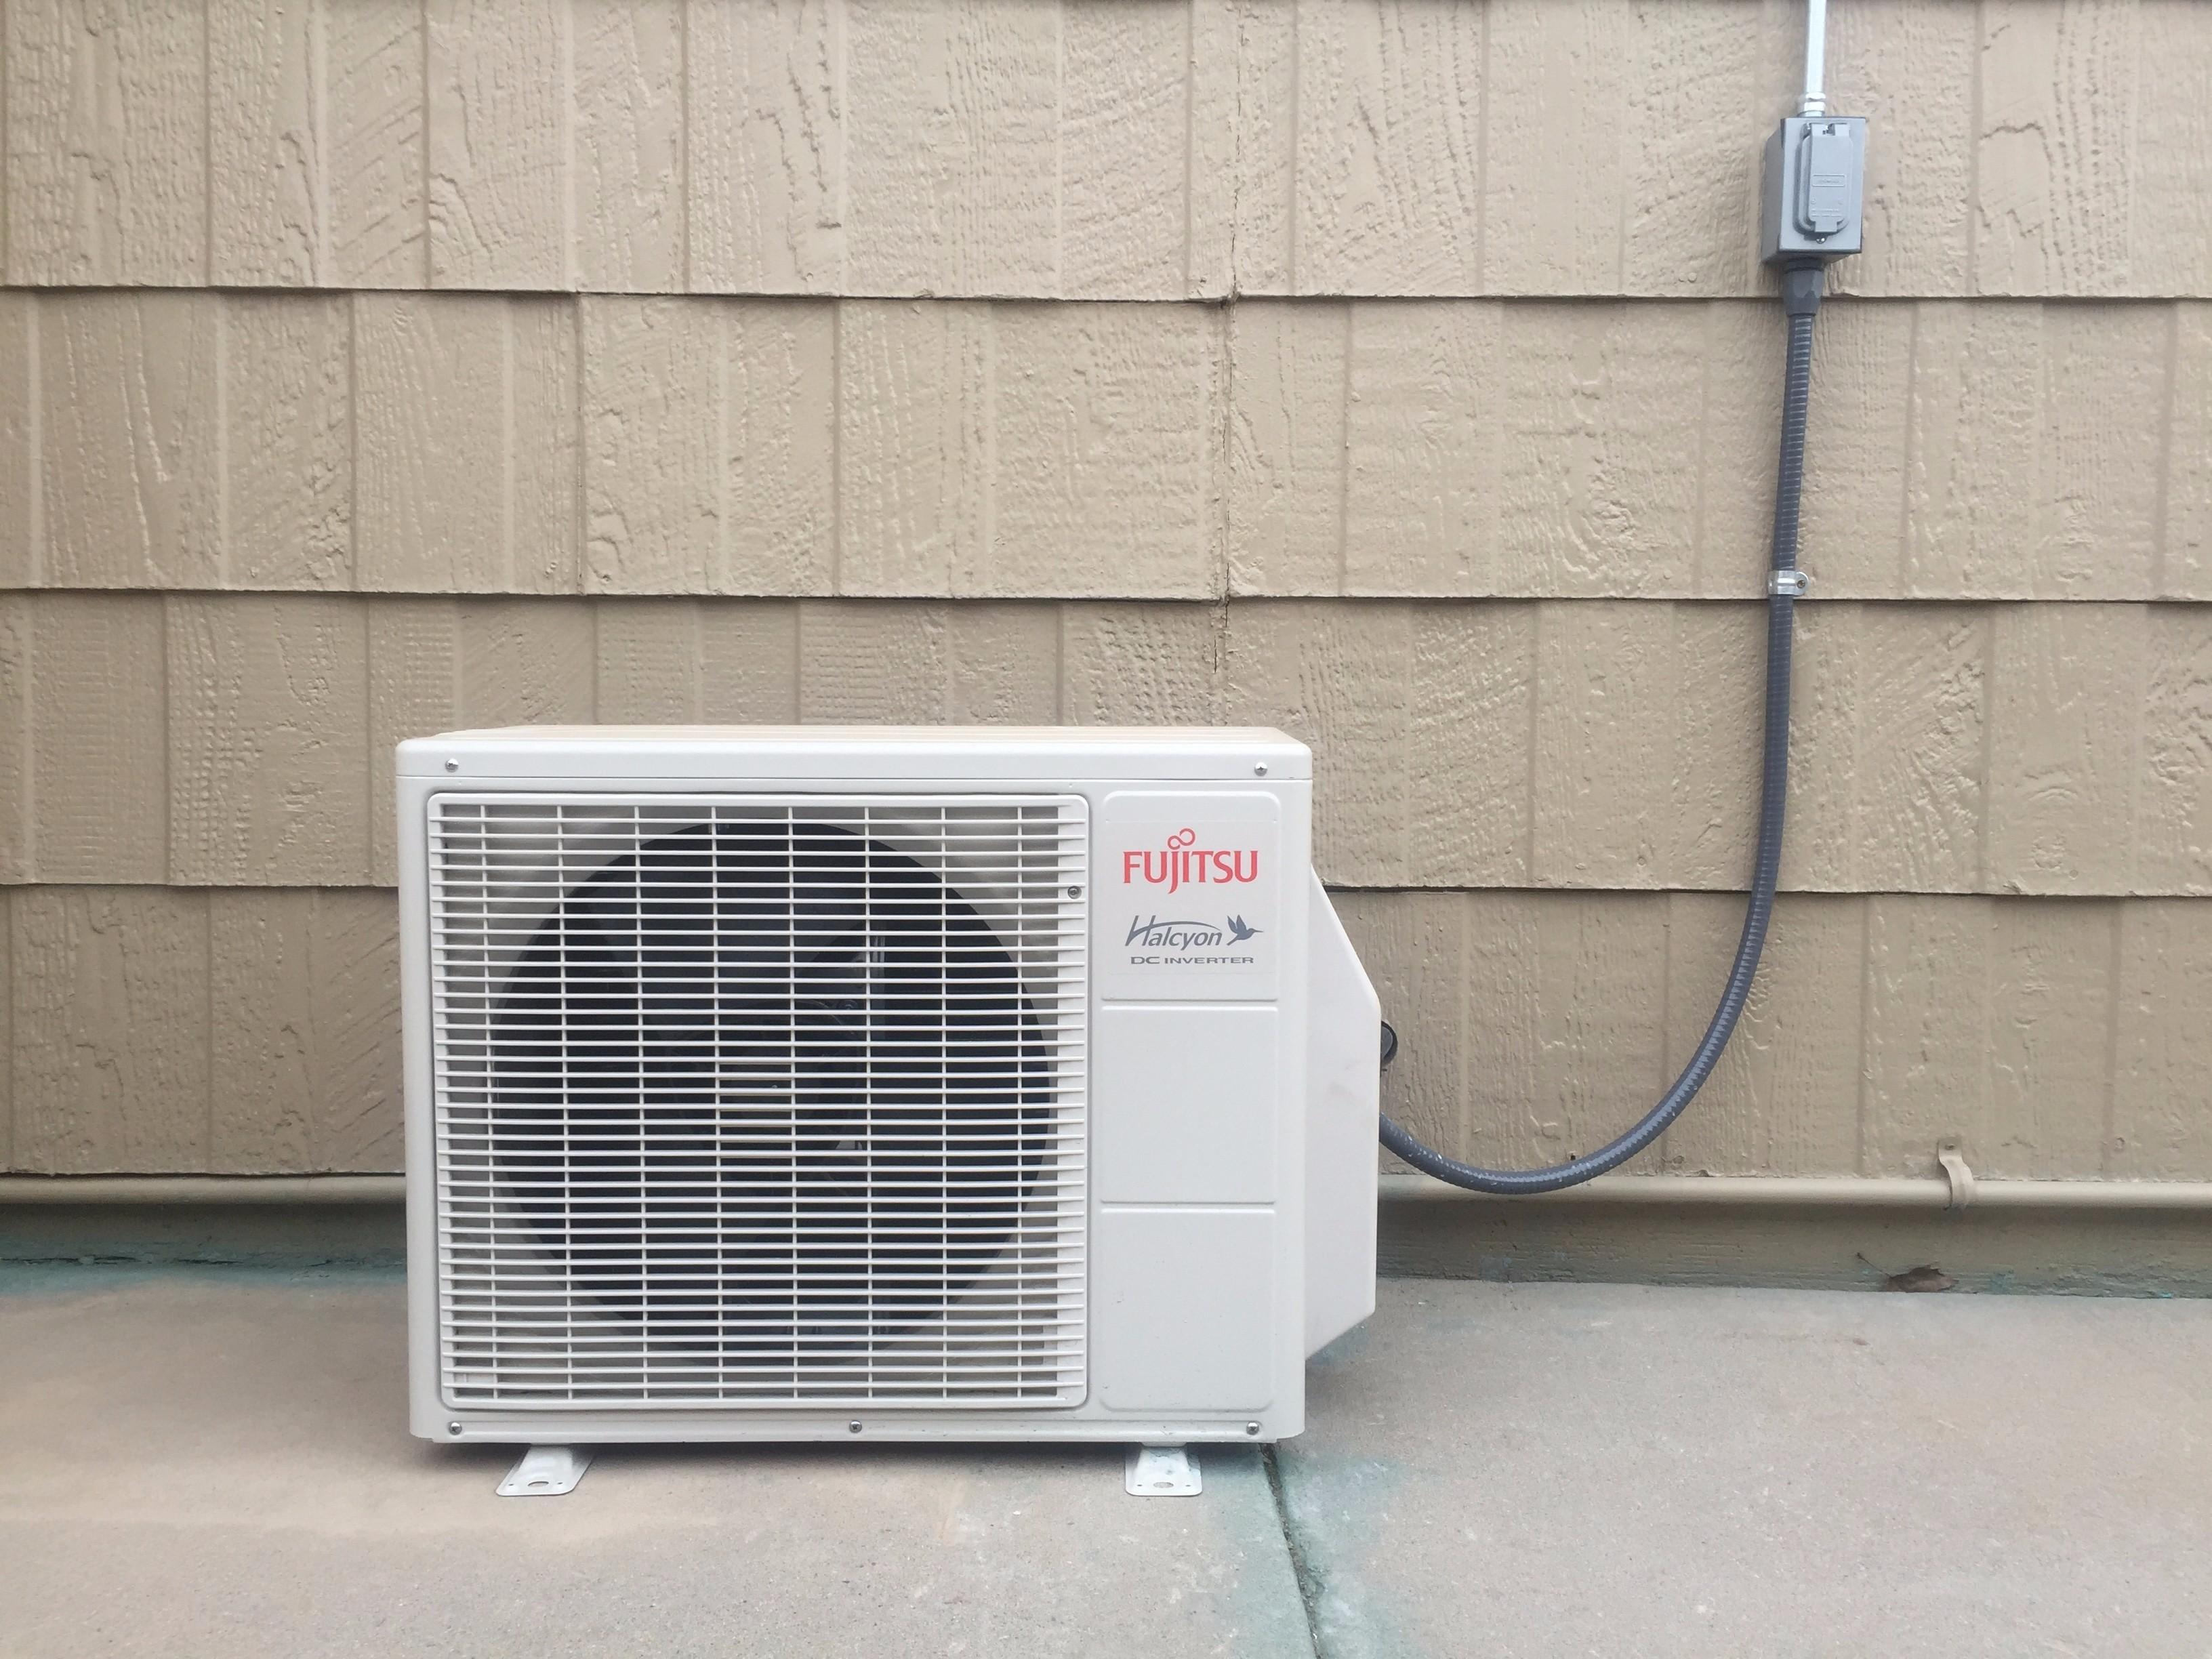 fujitsu mini split thermostat manuel - conhandpicpay gq